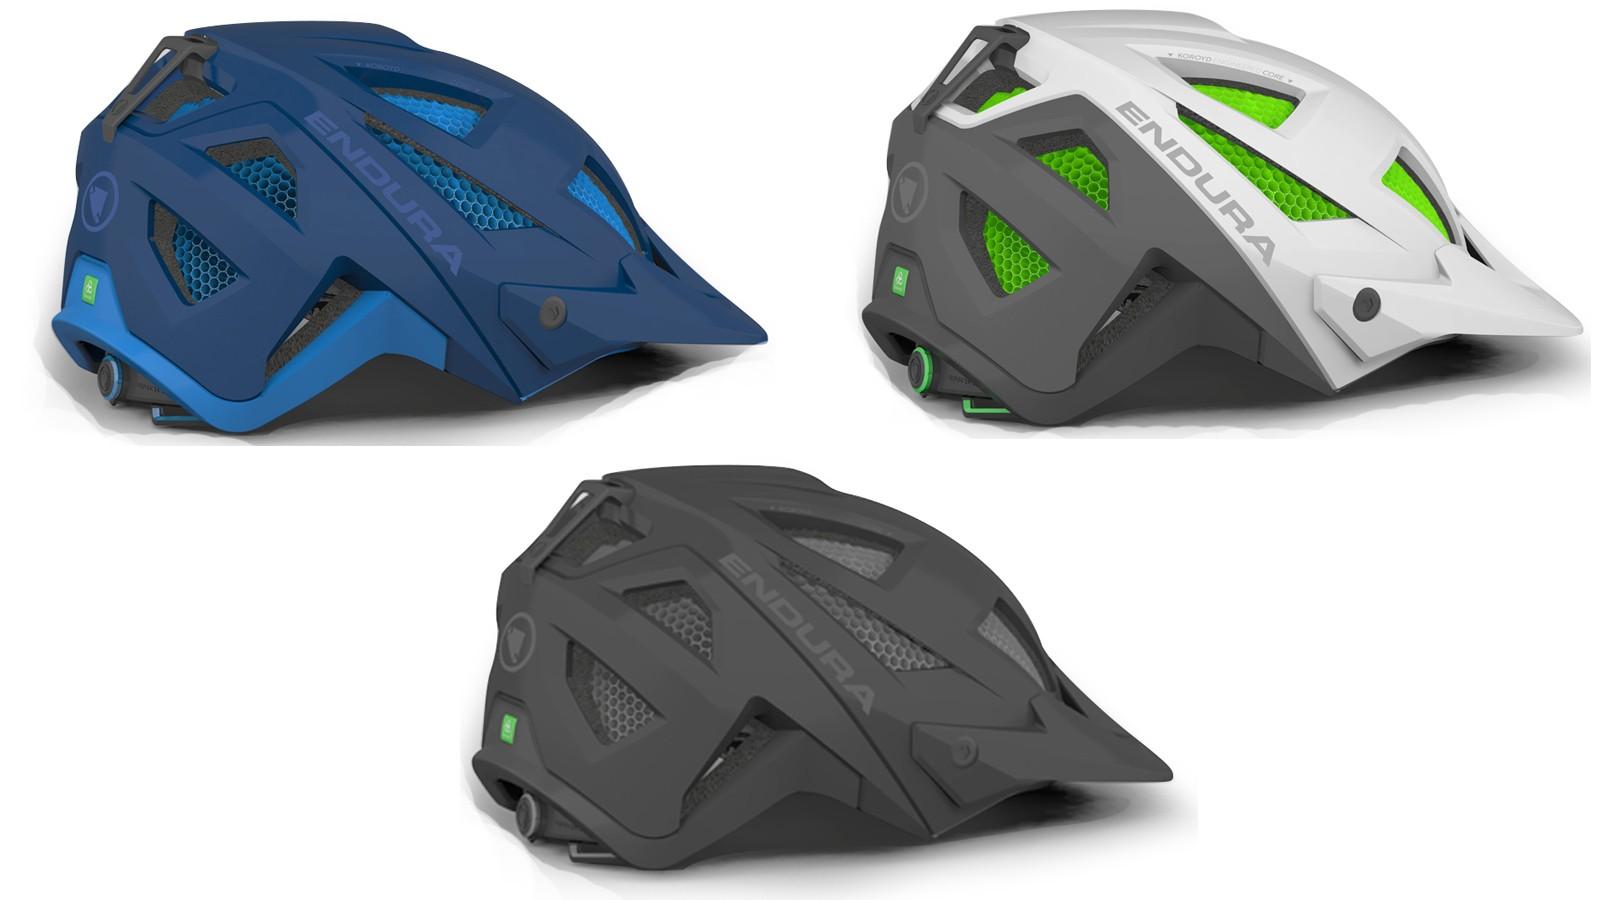 Endura's new MT500 helmet claims to be a safer helmet